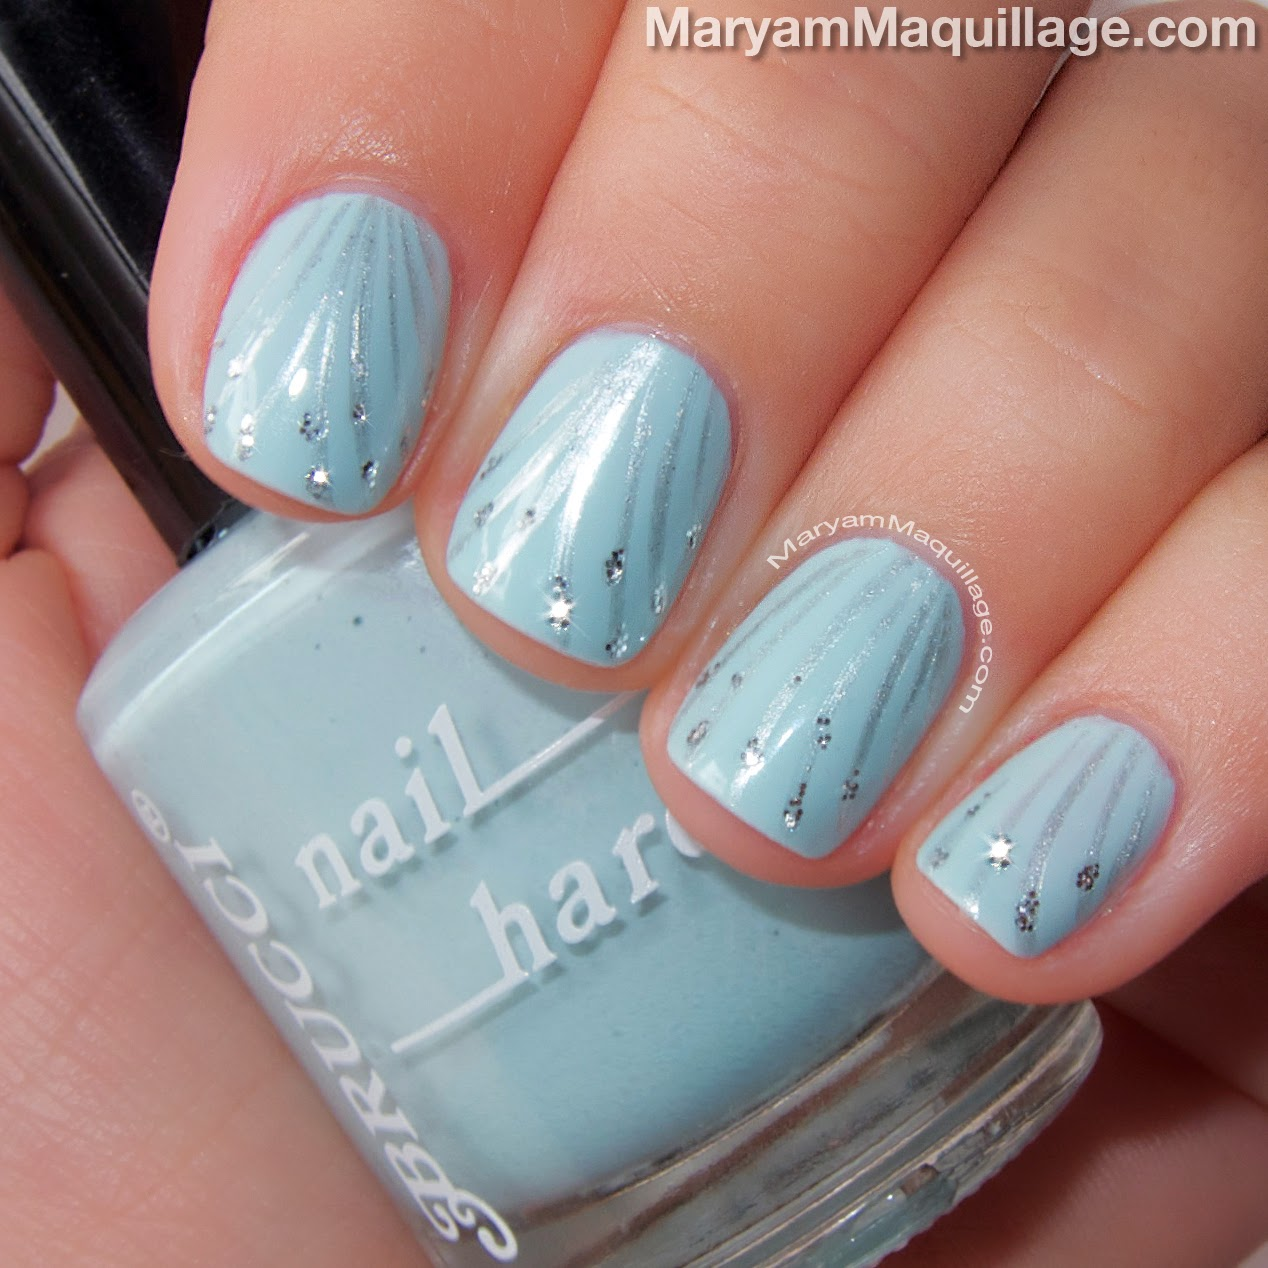 Maryam Maquillage: Spring Beauty Trend: Pastel NailArt